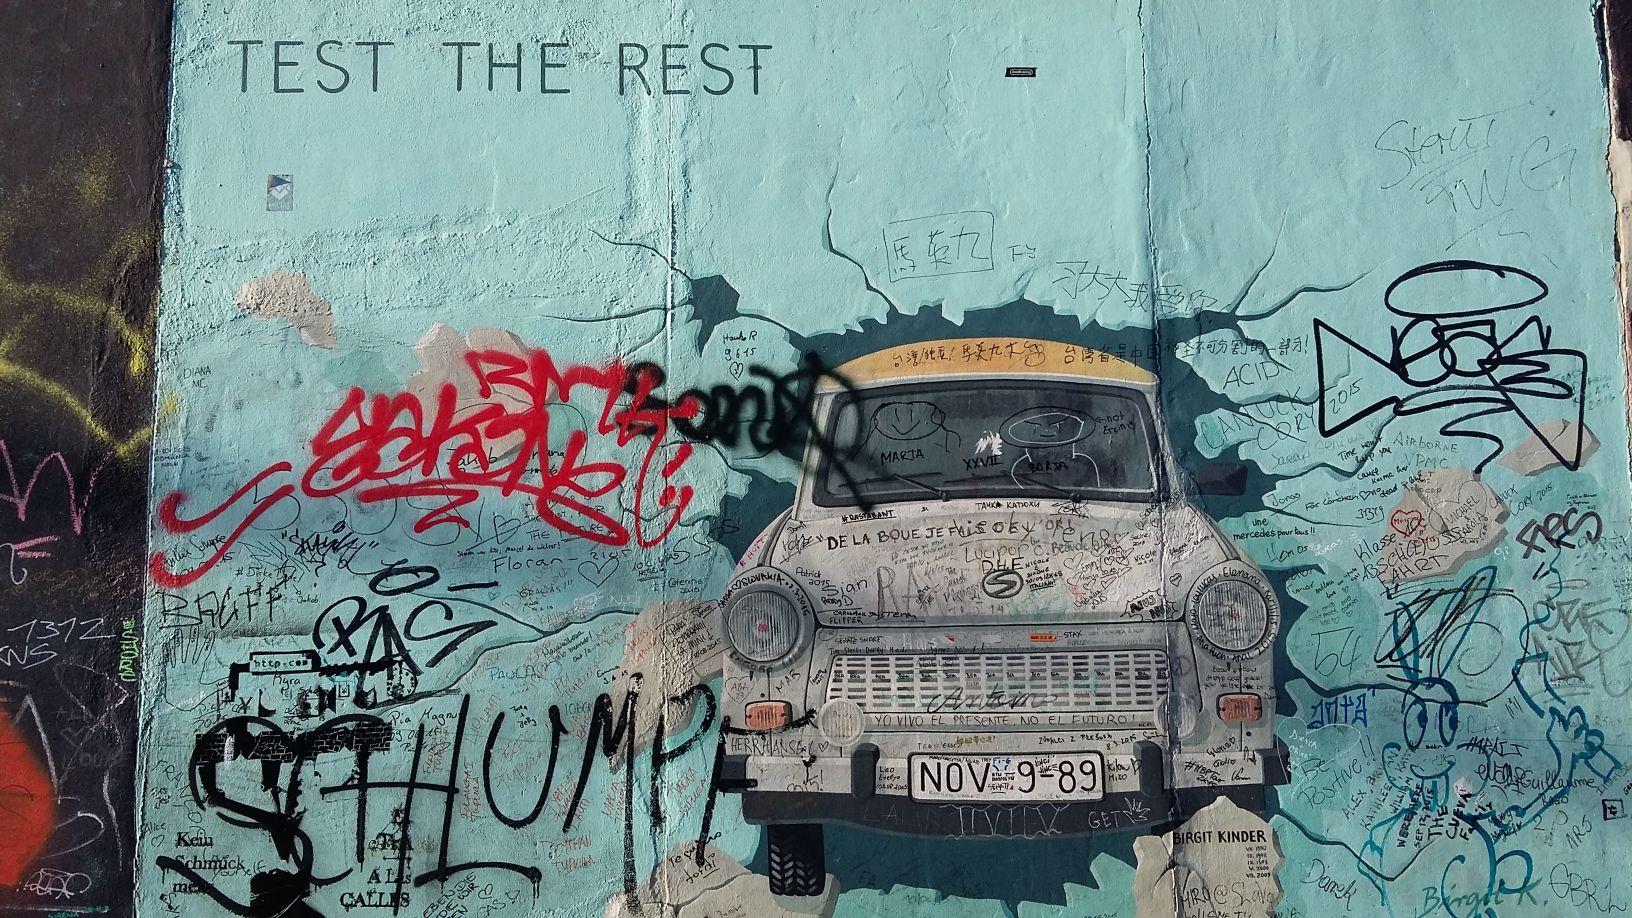 Berlin S East Side Gallery Graffiti From The Street